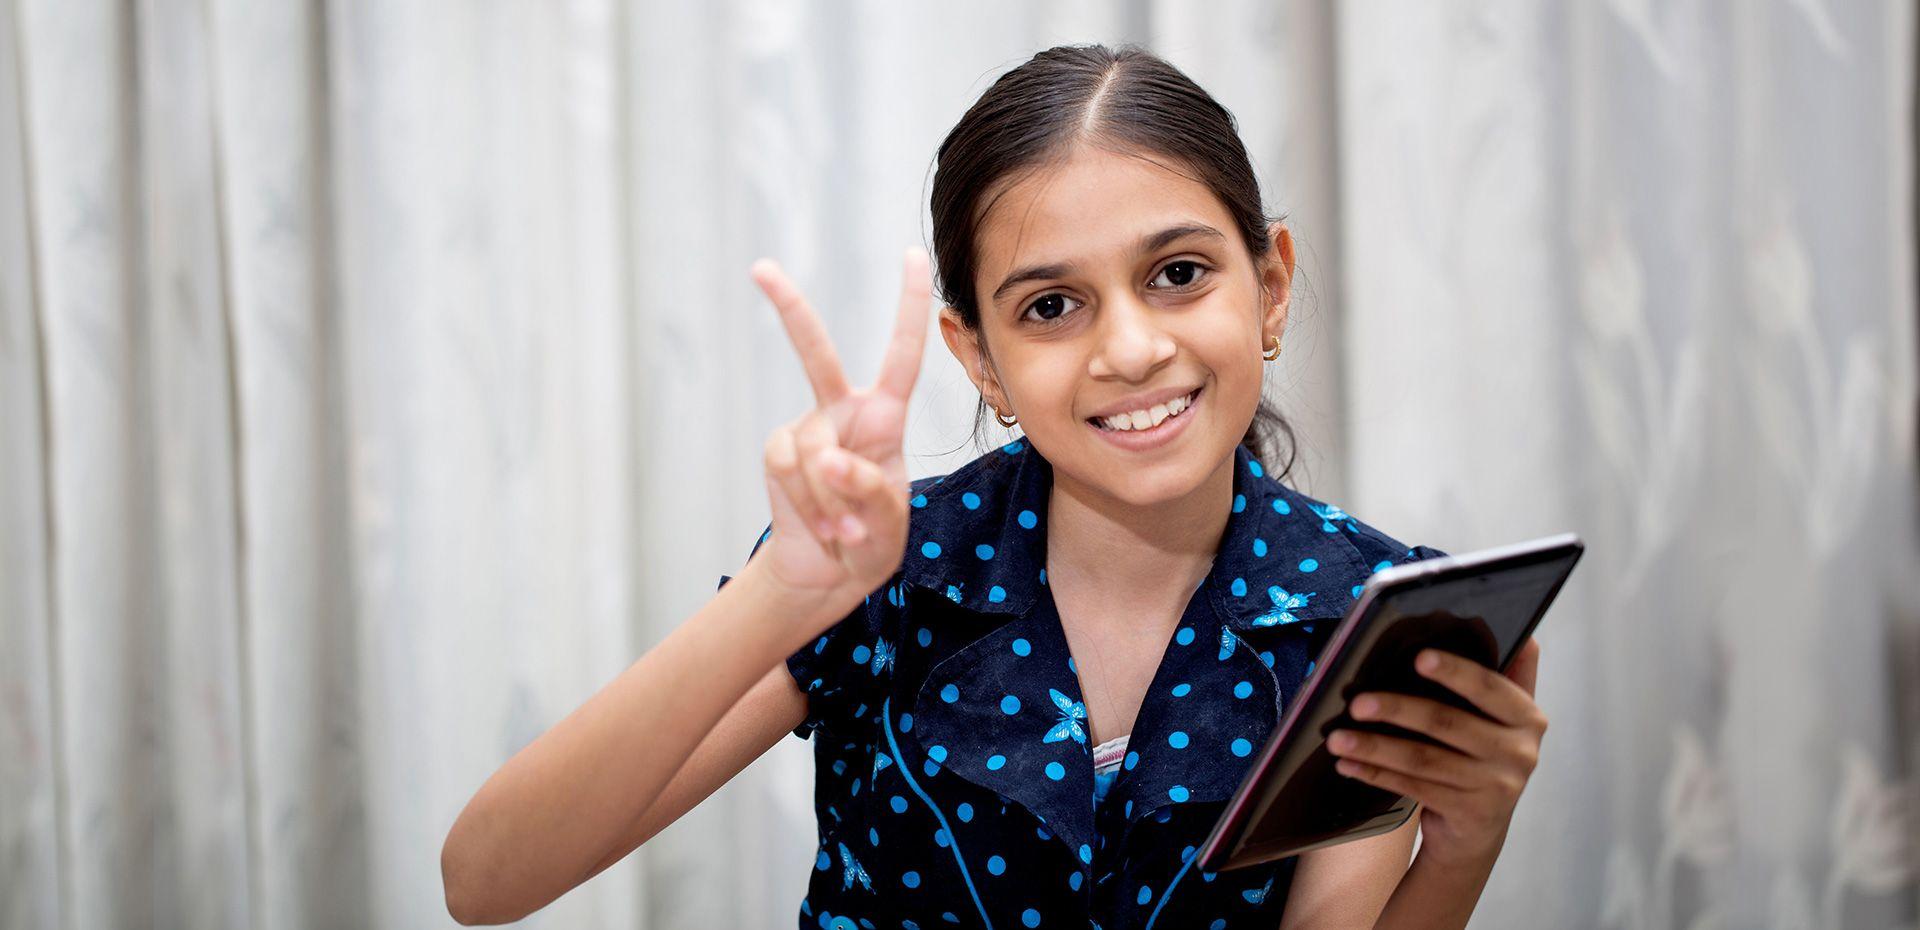 Pupil case study – Ariv, age 12